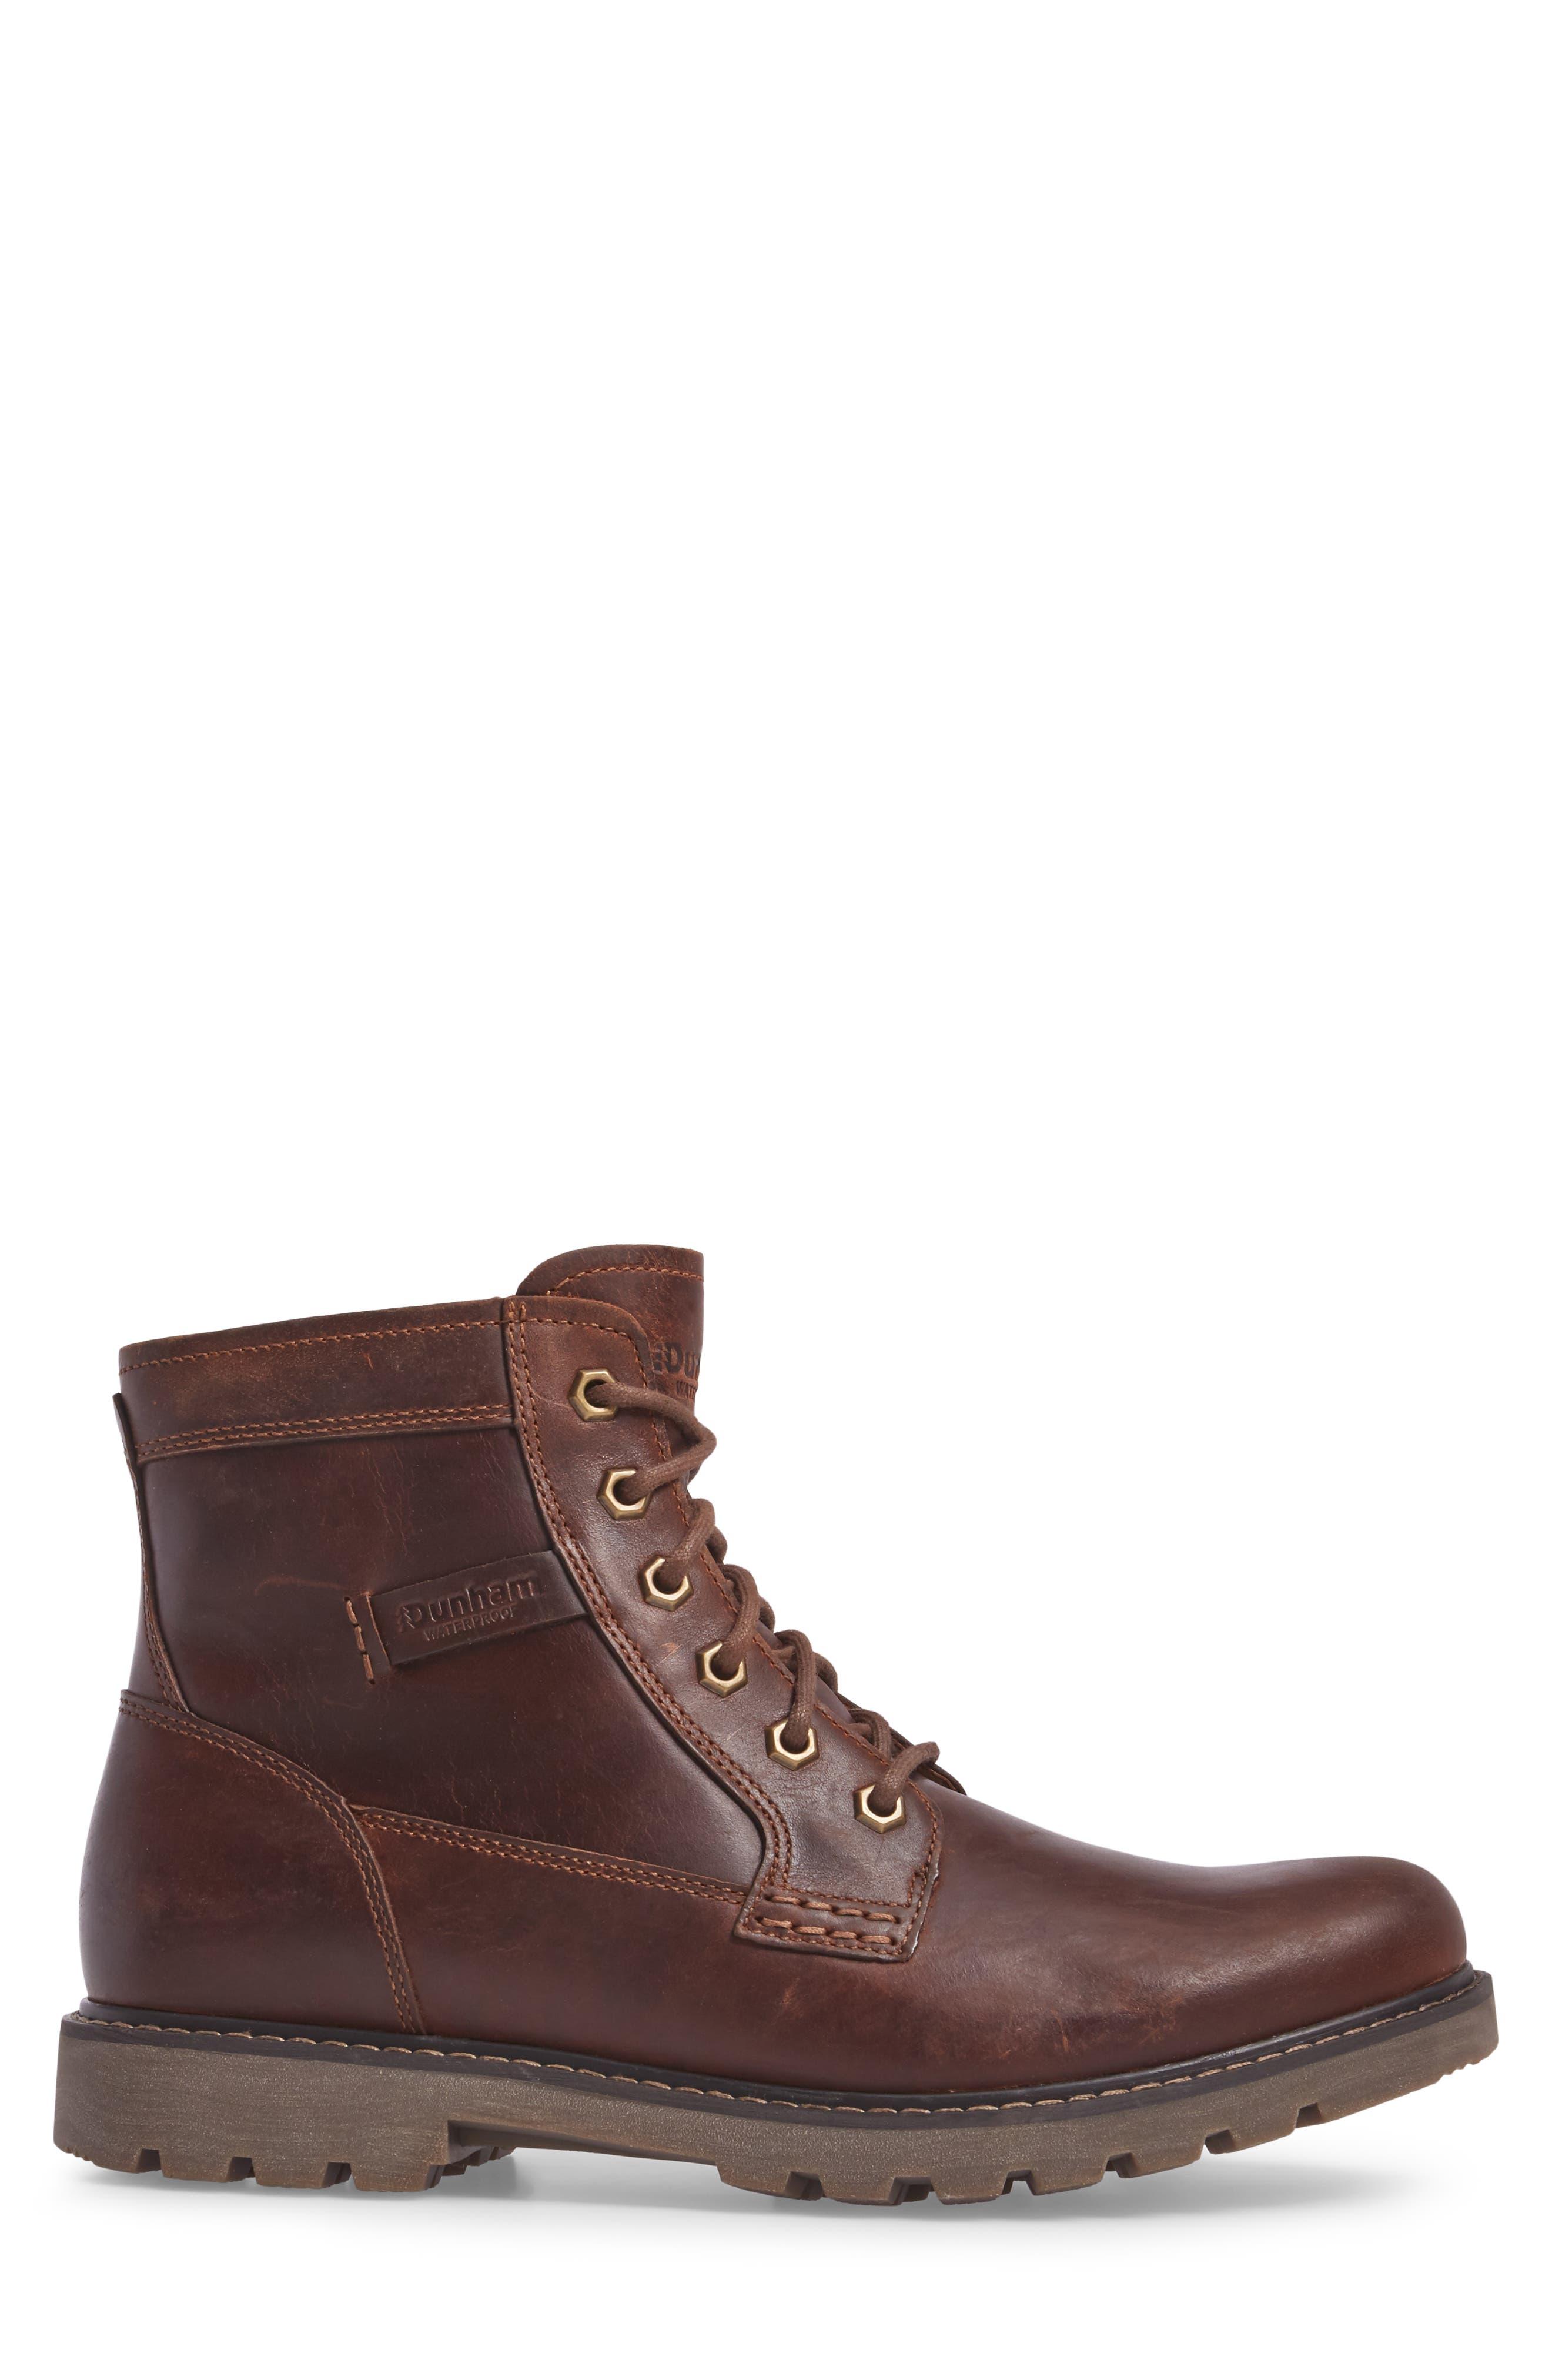 DUNHAM, Royalton Plain Toe Boot, Alternate thumbnail 3, color, BROWN